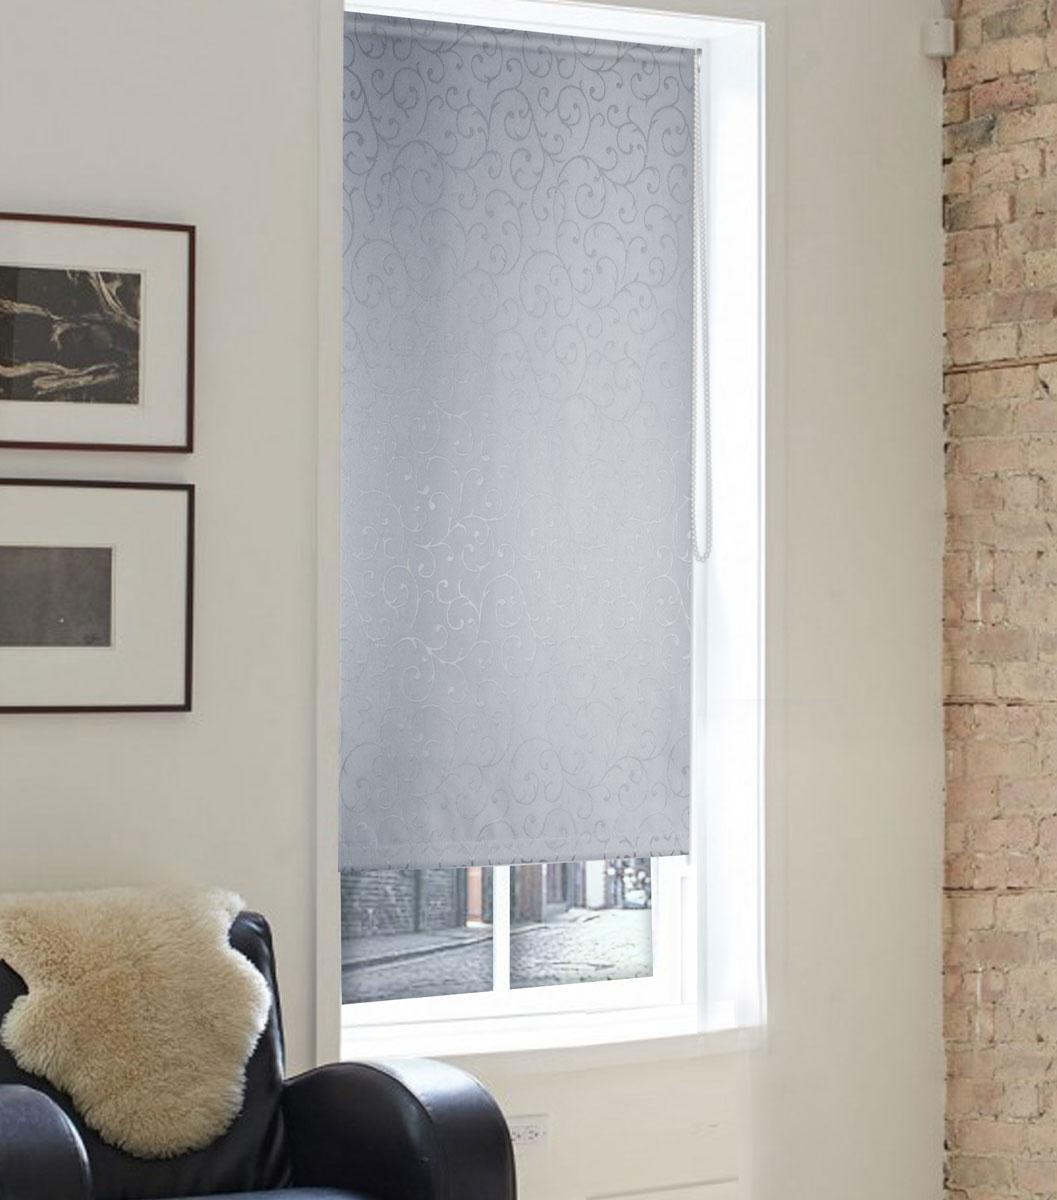 Штора рулонная Эскар Миниролло. Агат, цвет: серый, ширина 57 см, высота 160 см штора рулонная эскар миниролло агат цвет серый ширина 73 см высота 160 см